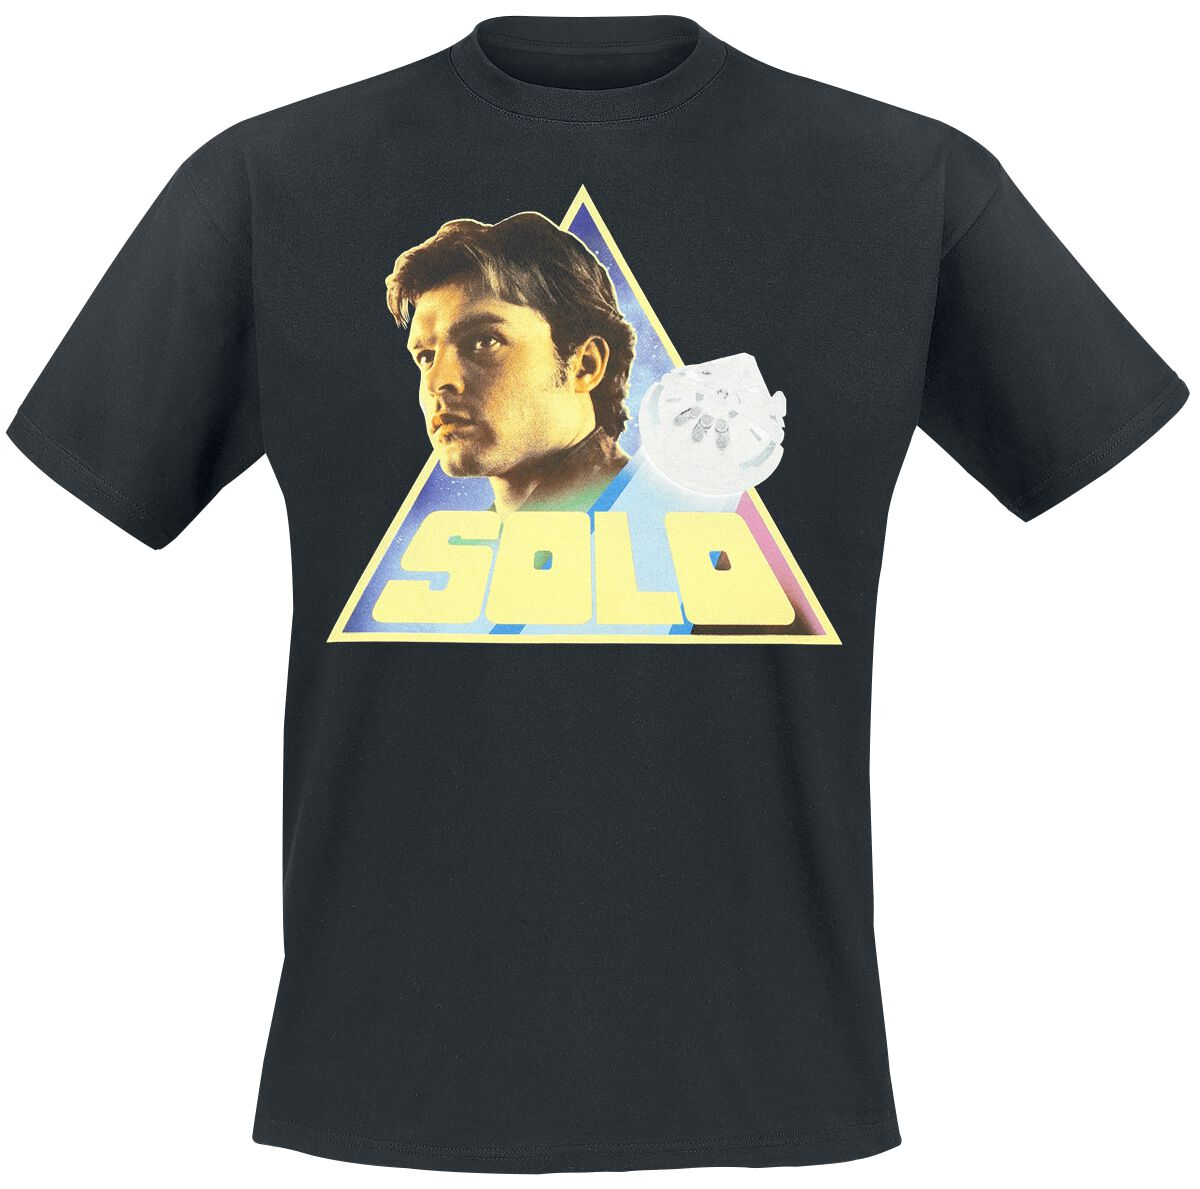 Star Wars Solo: A Star Wars Story - Retro Trian...